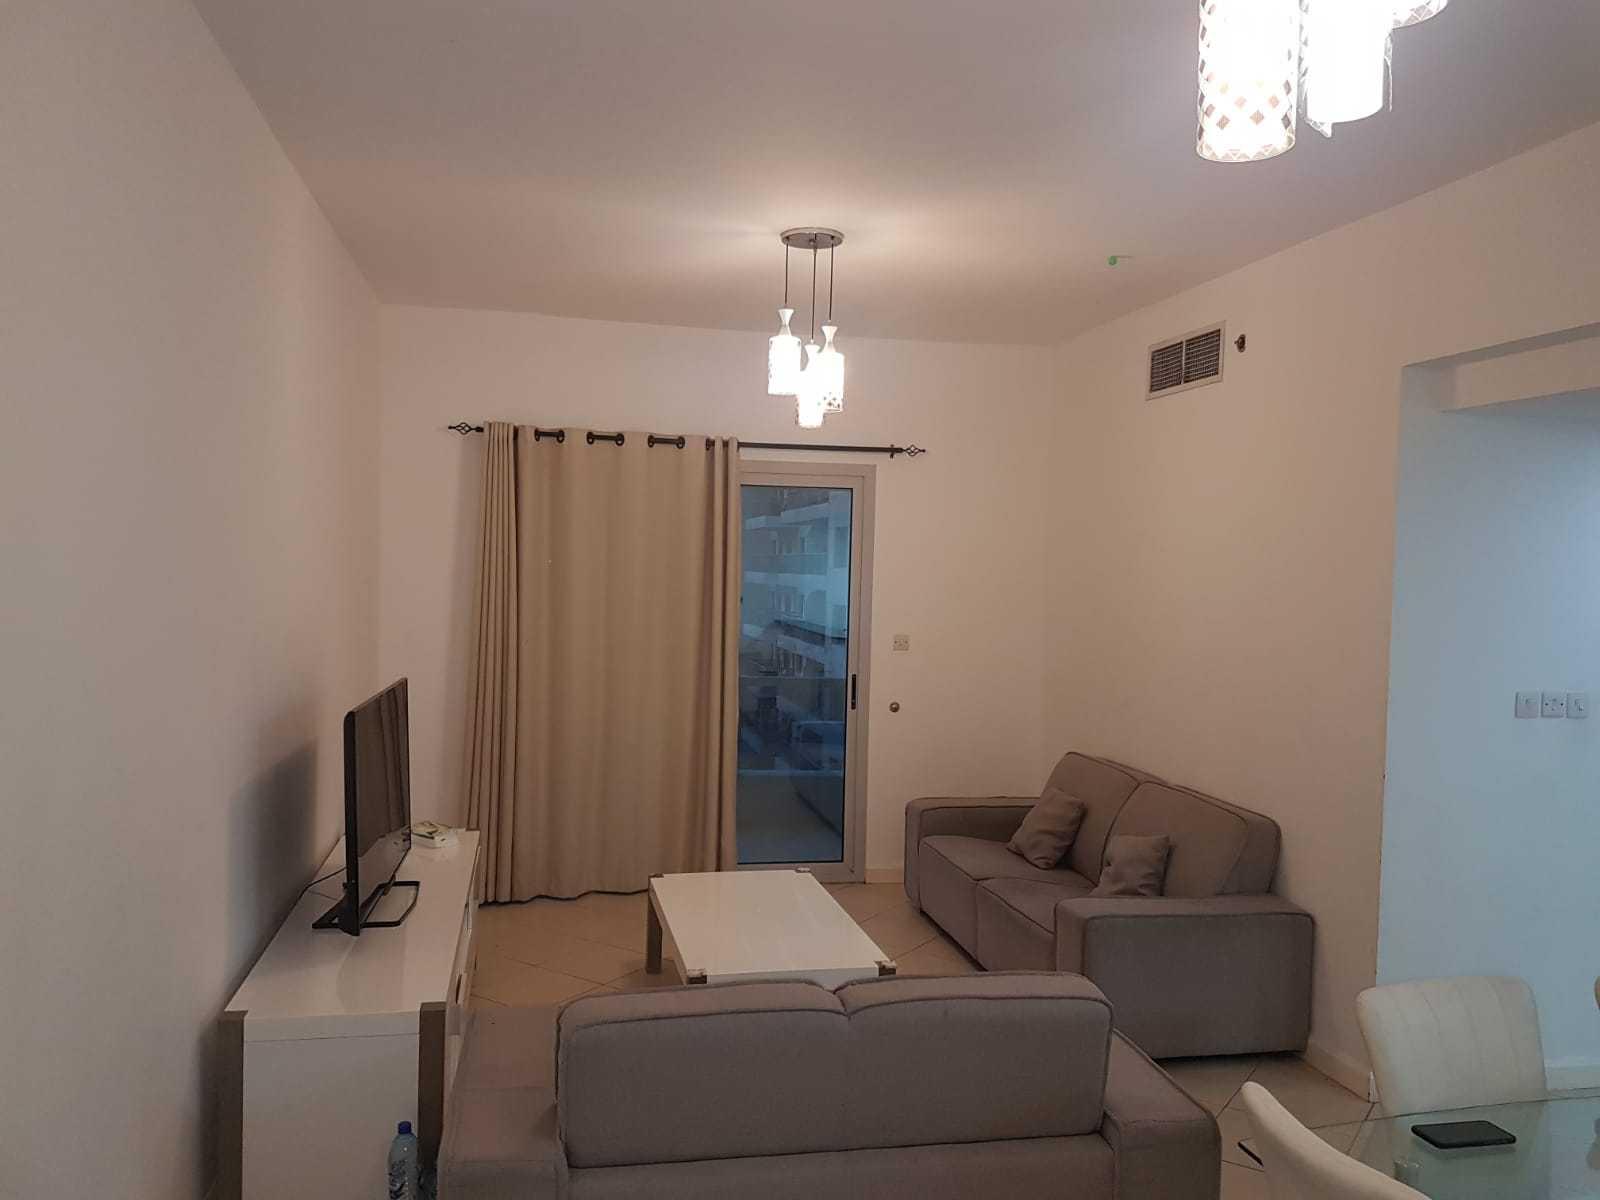 Spacious  2 Bedroom + Hall For Rent 75k In Marina Diamond 1 Dubai Marina With Partial Marina View